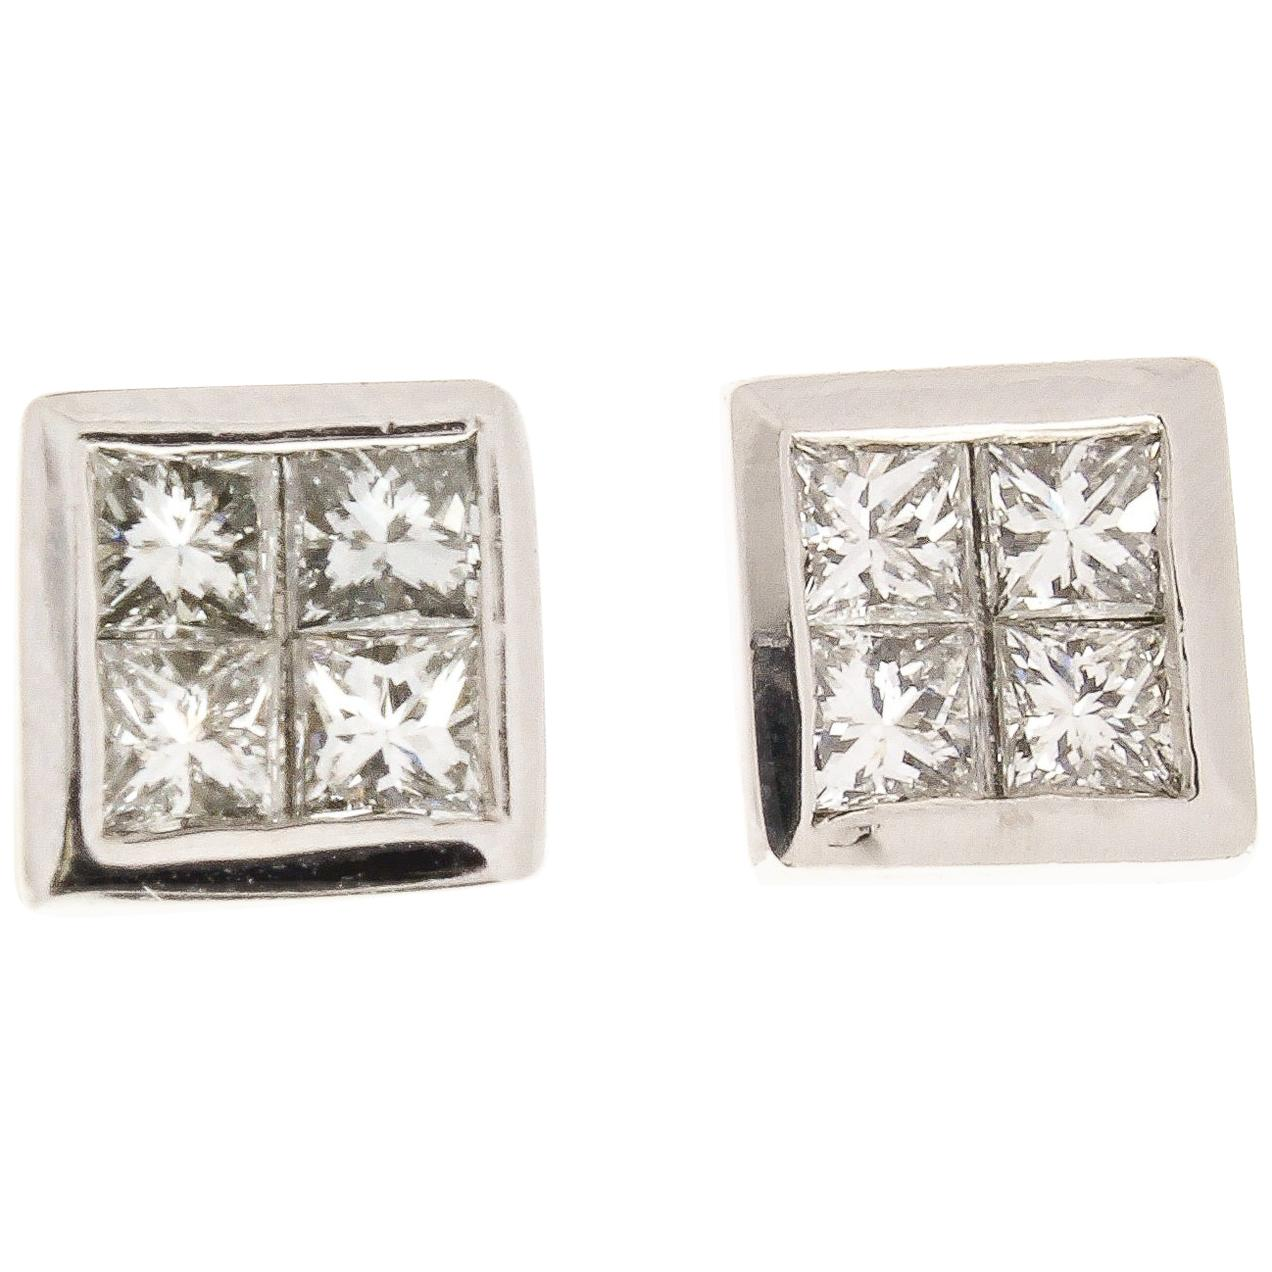 1.00 Carat Total Princess Cut Diamond Earrings in 18 Karat White Gold